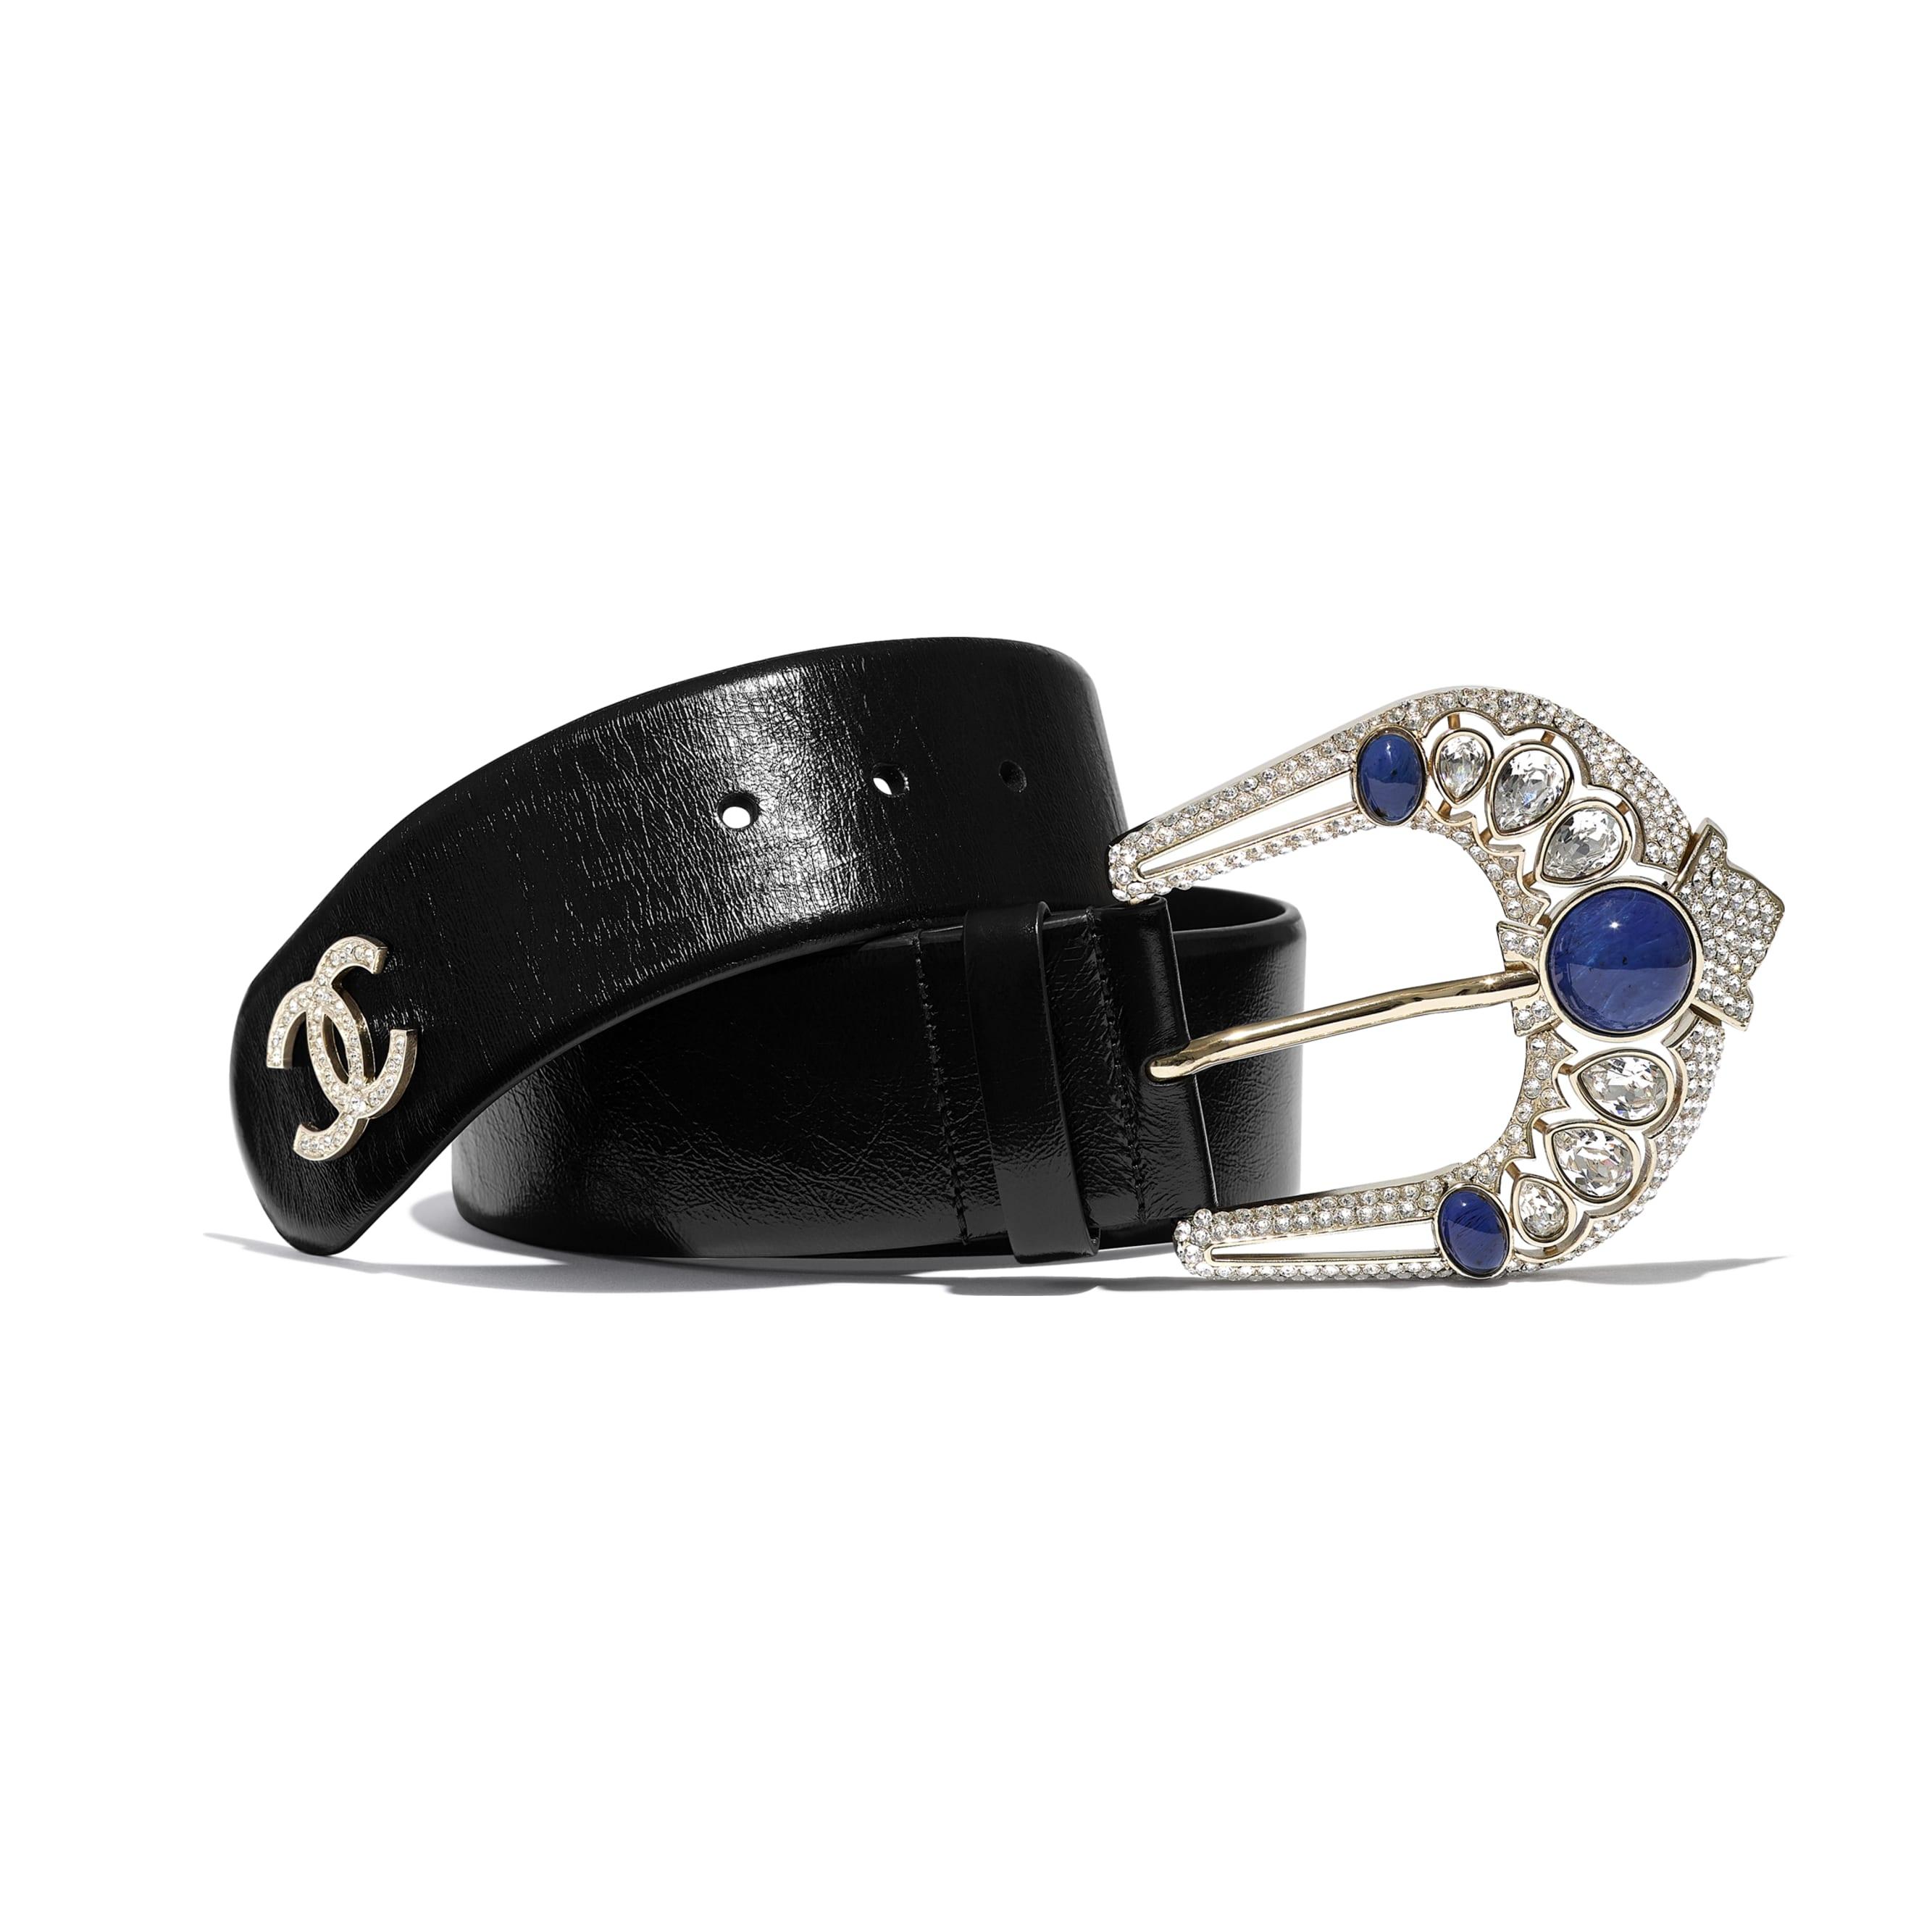 Belt - Black & Blue - Calfskin, Gold-Tone Metal, Strass & Resin - Default view - see standard sized version